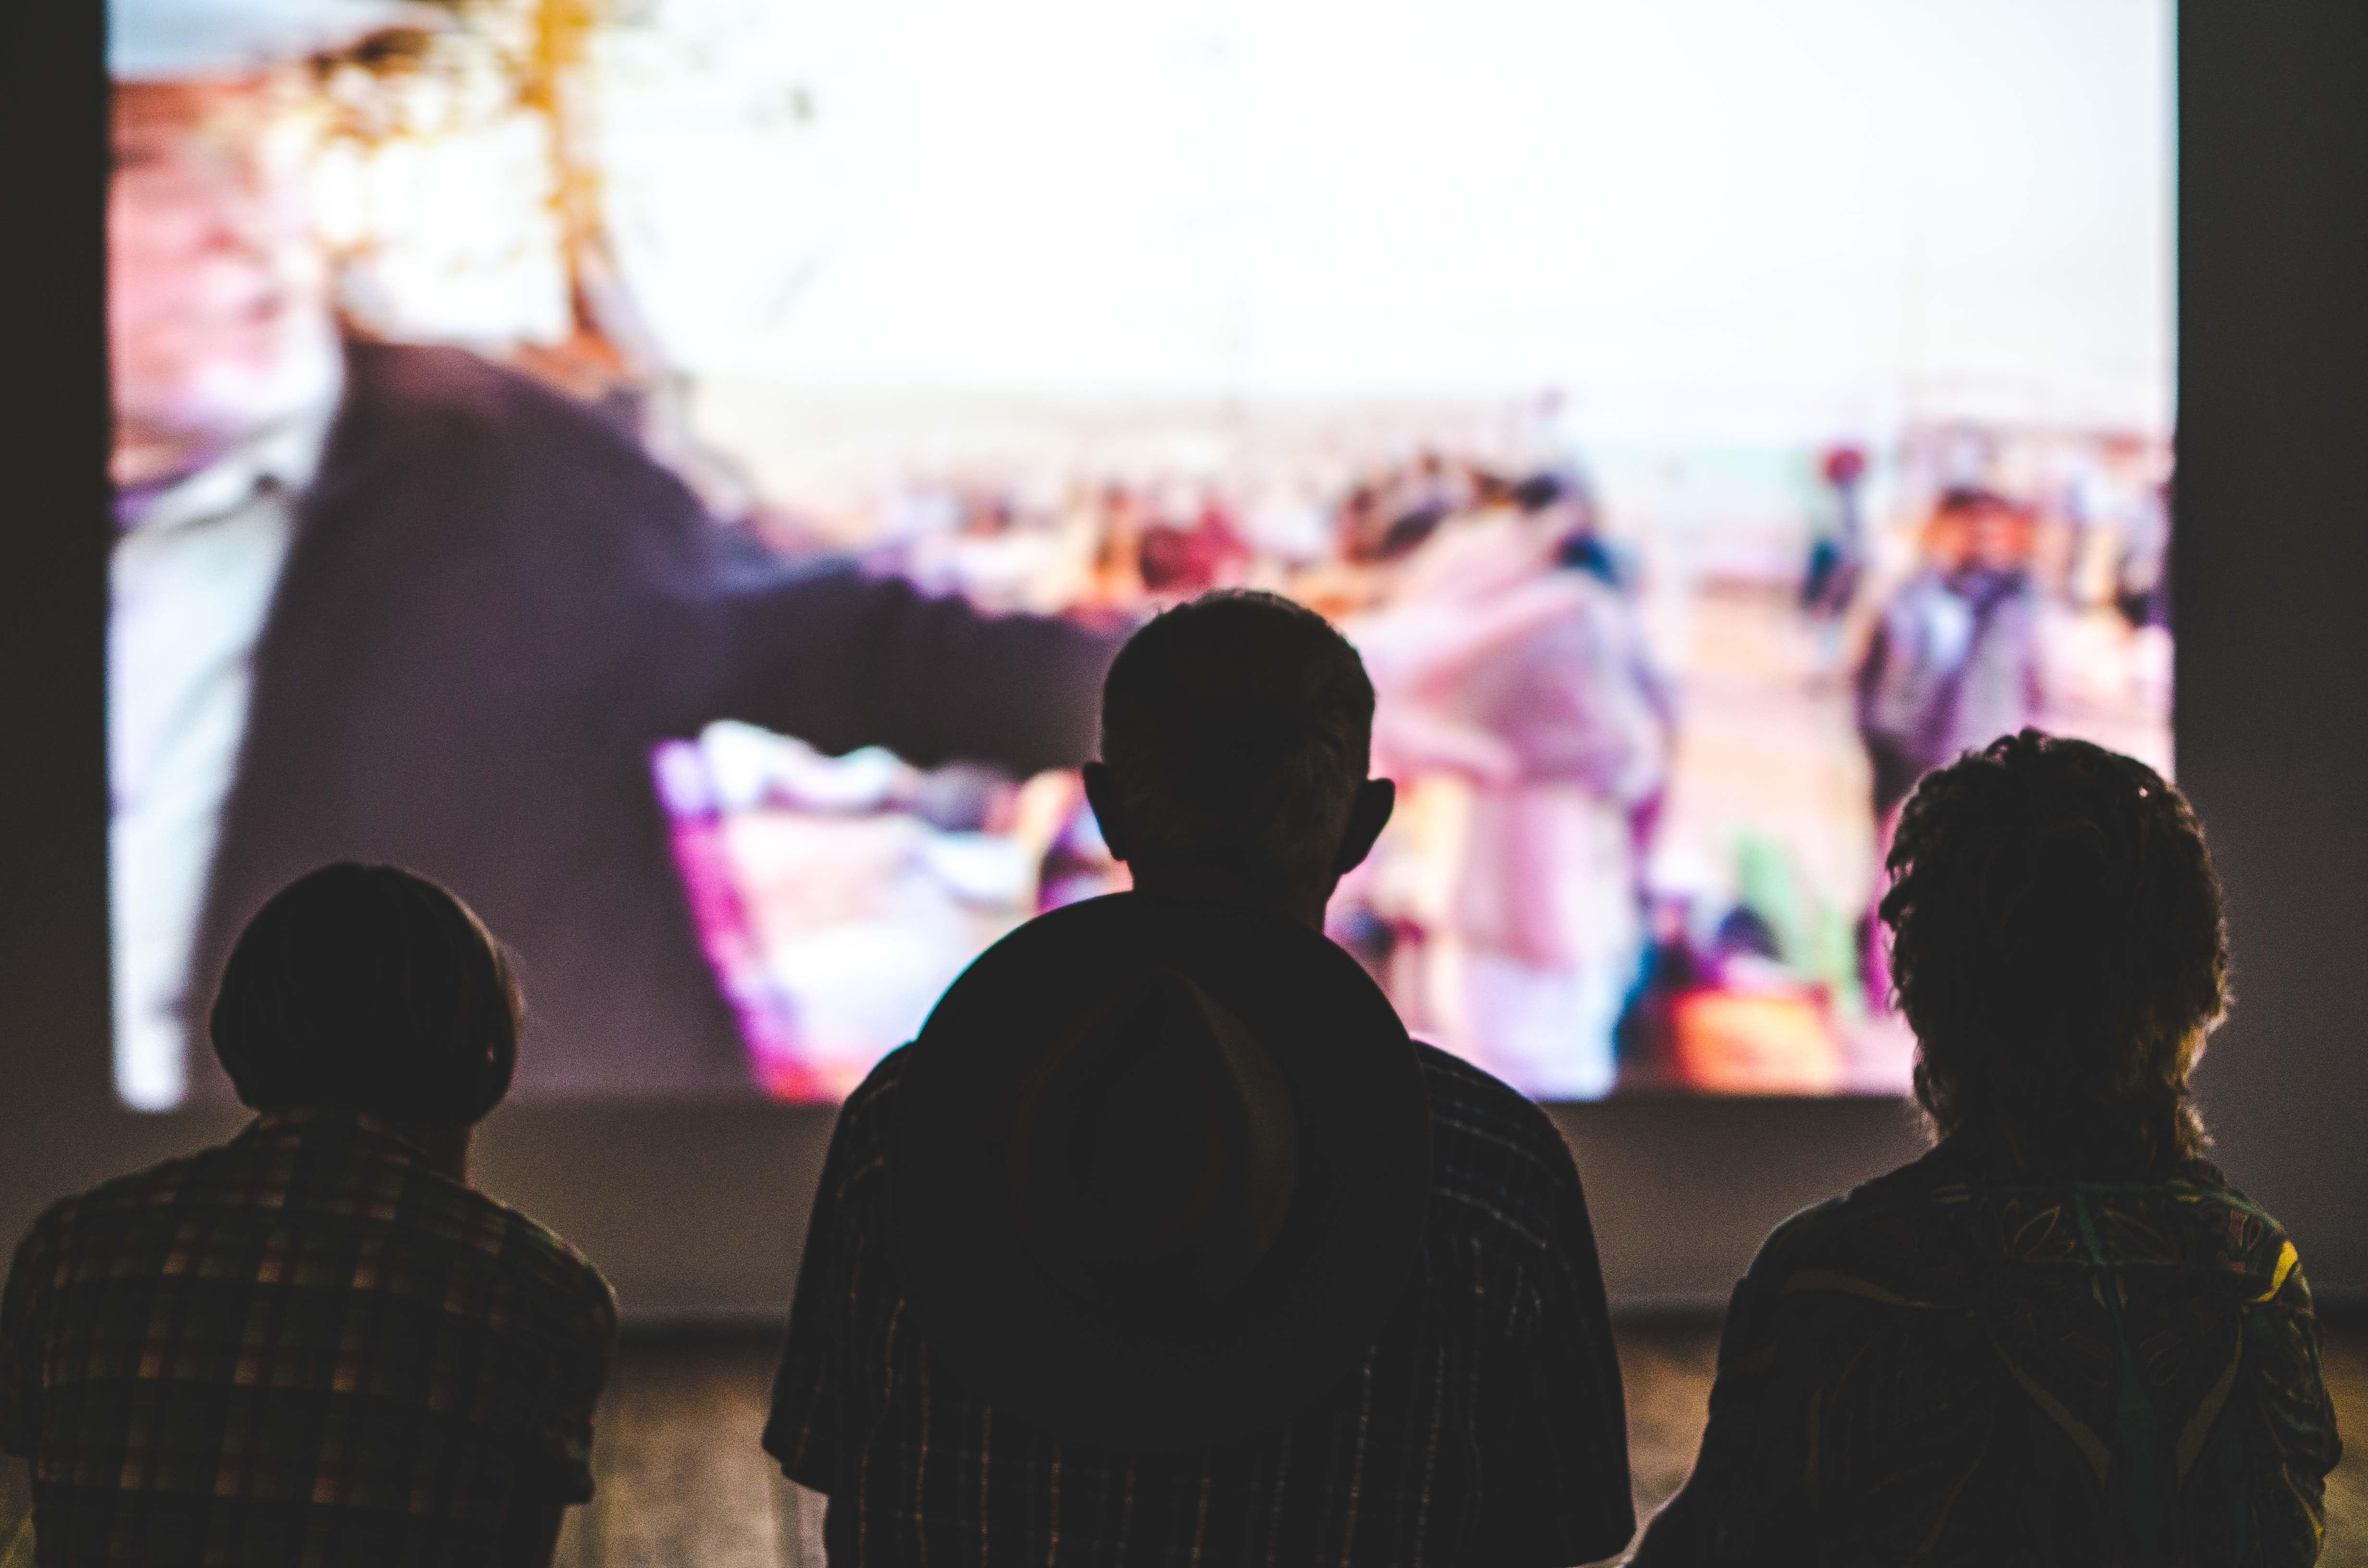 Menonton televisi menghangatkan keluarga